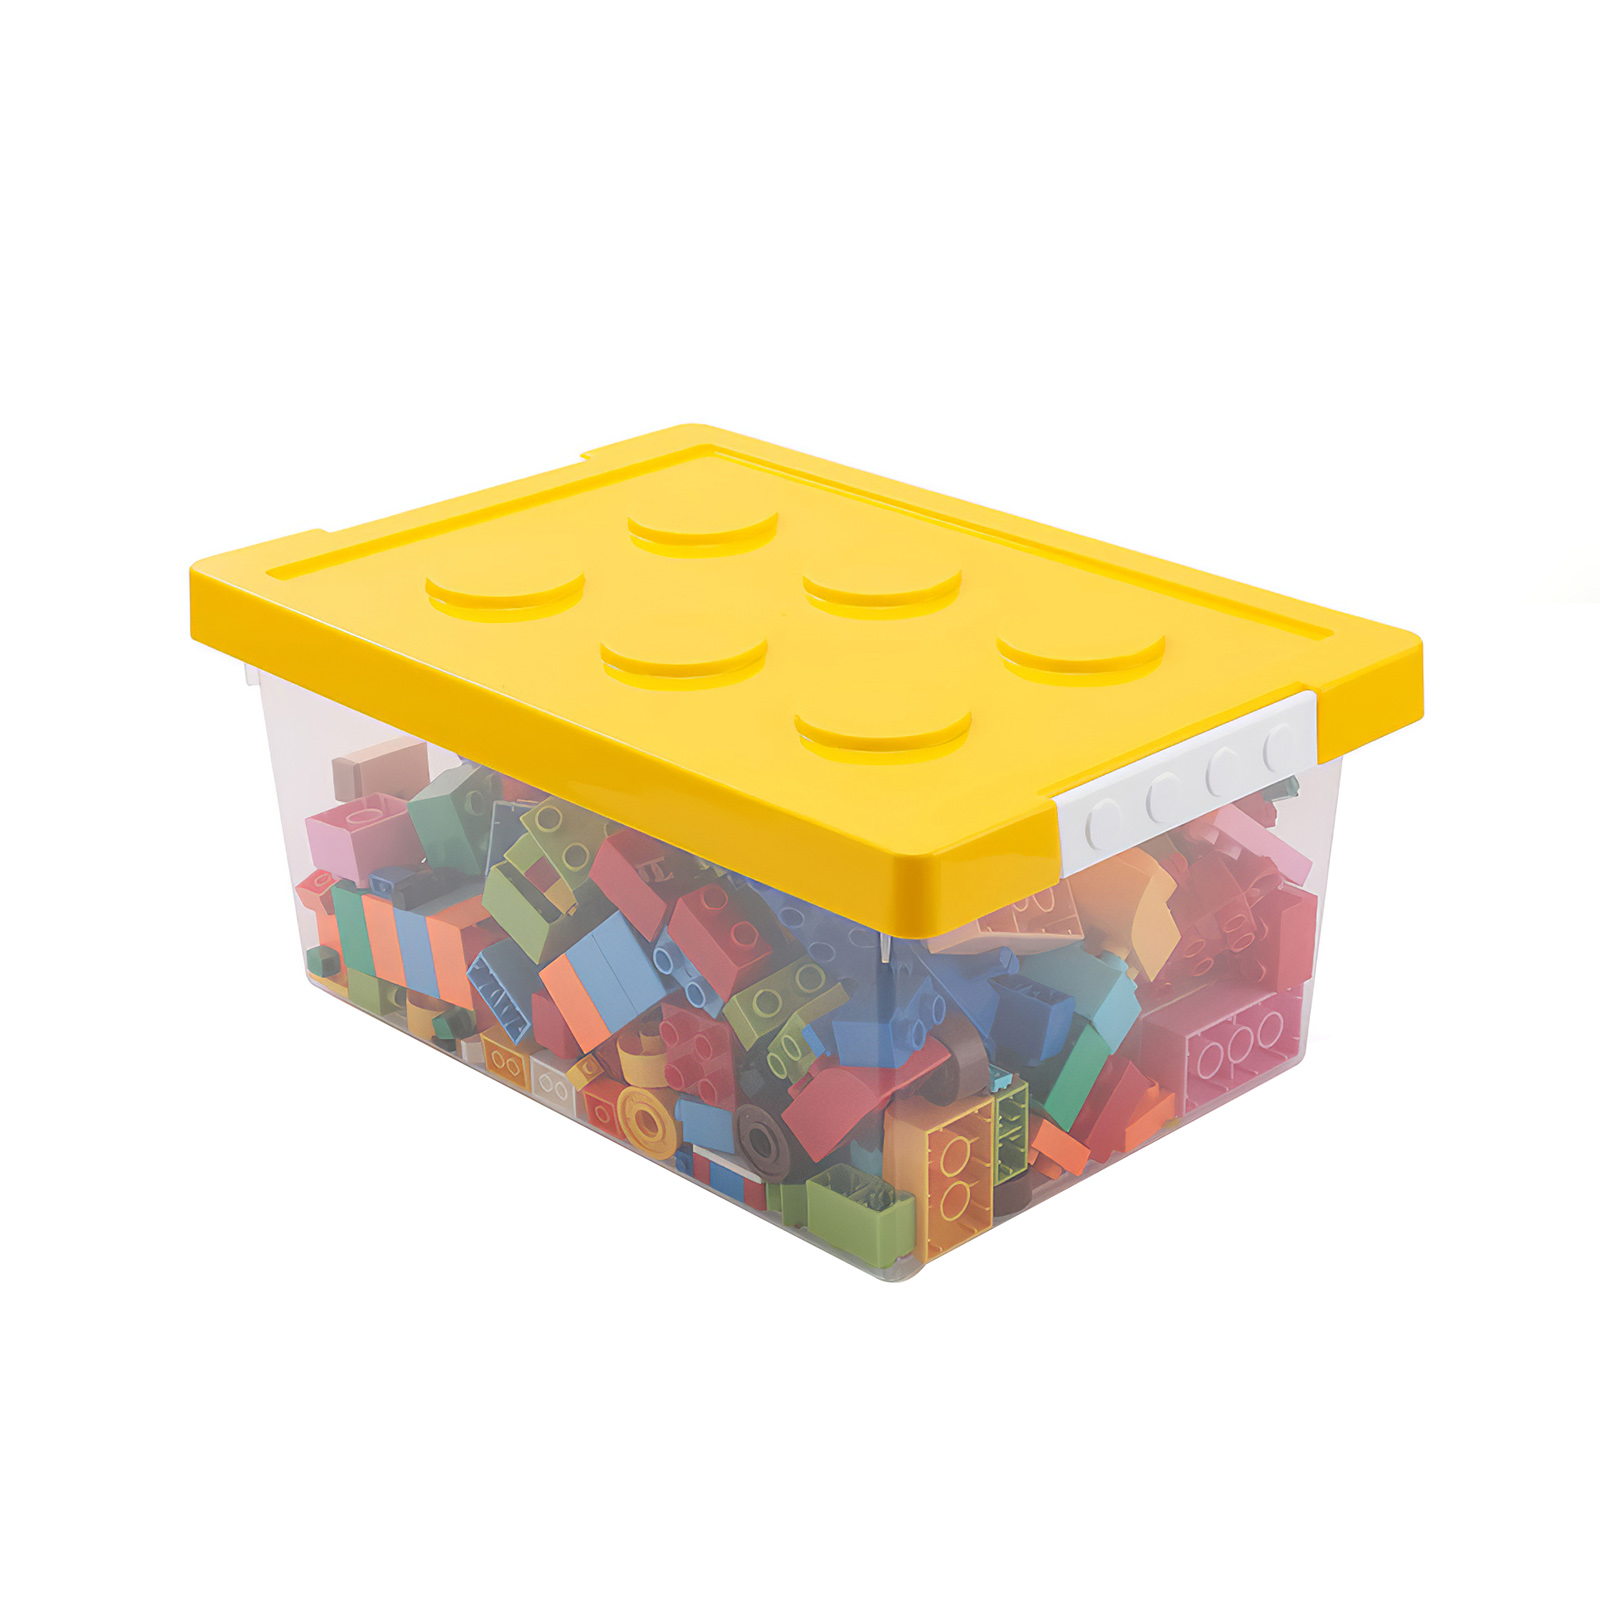 Building Block Storage Box Toys Organizer Kids Lego Box Stackable Block Case Container Desktop Stationary Holder